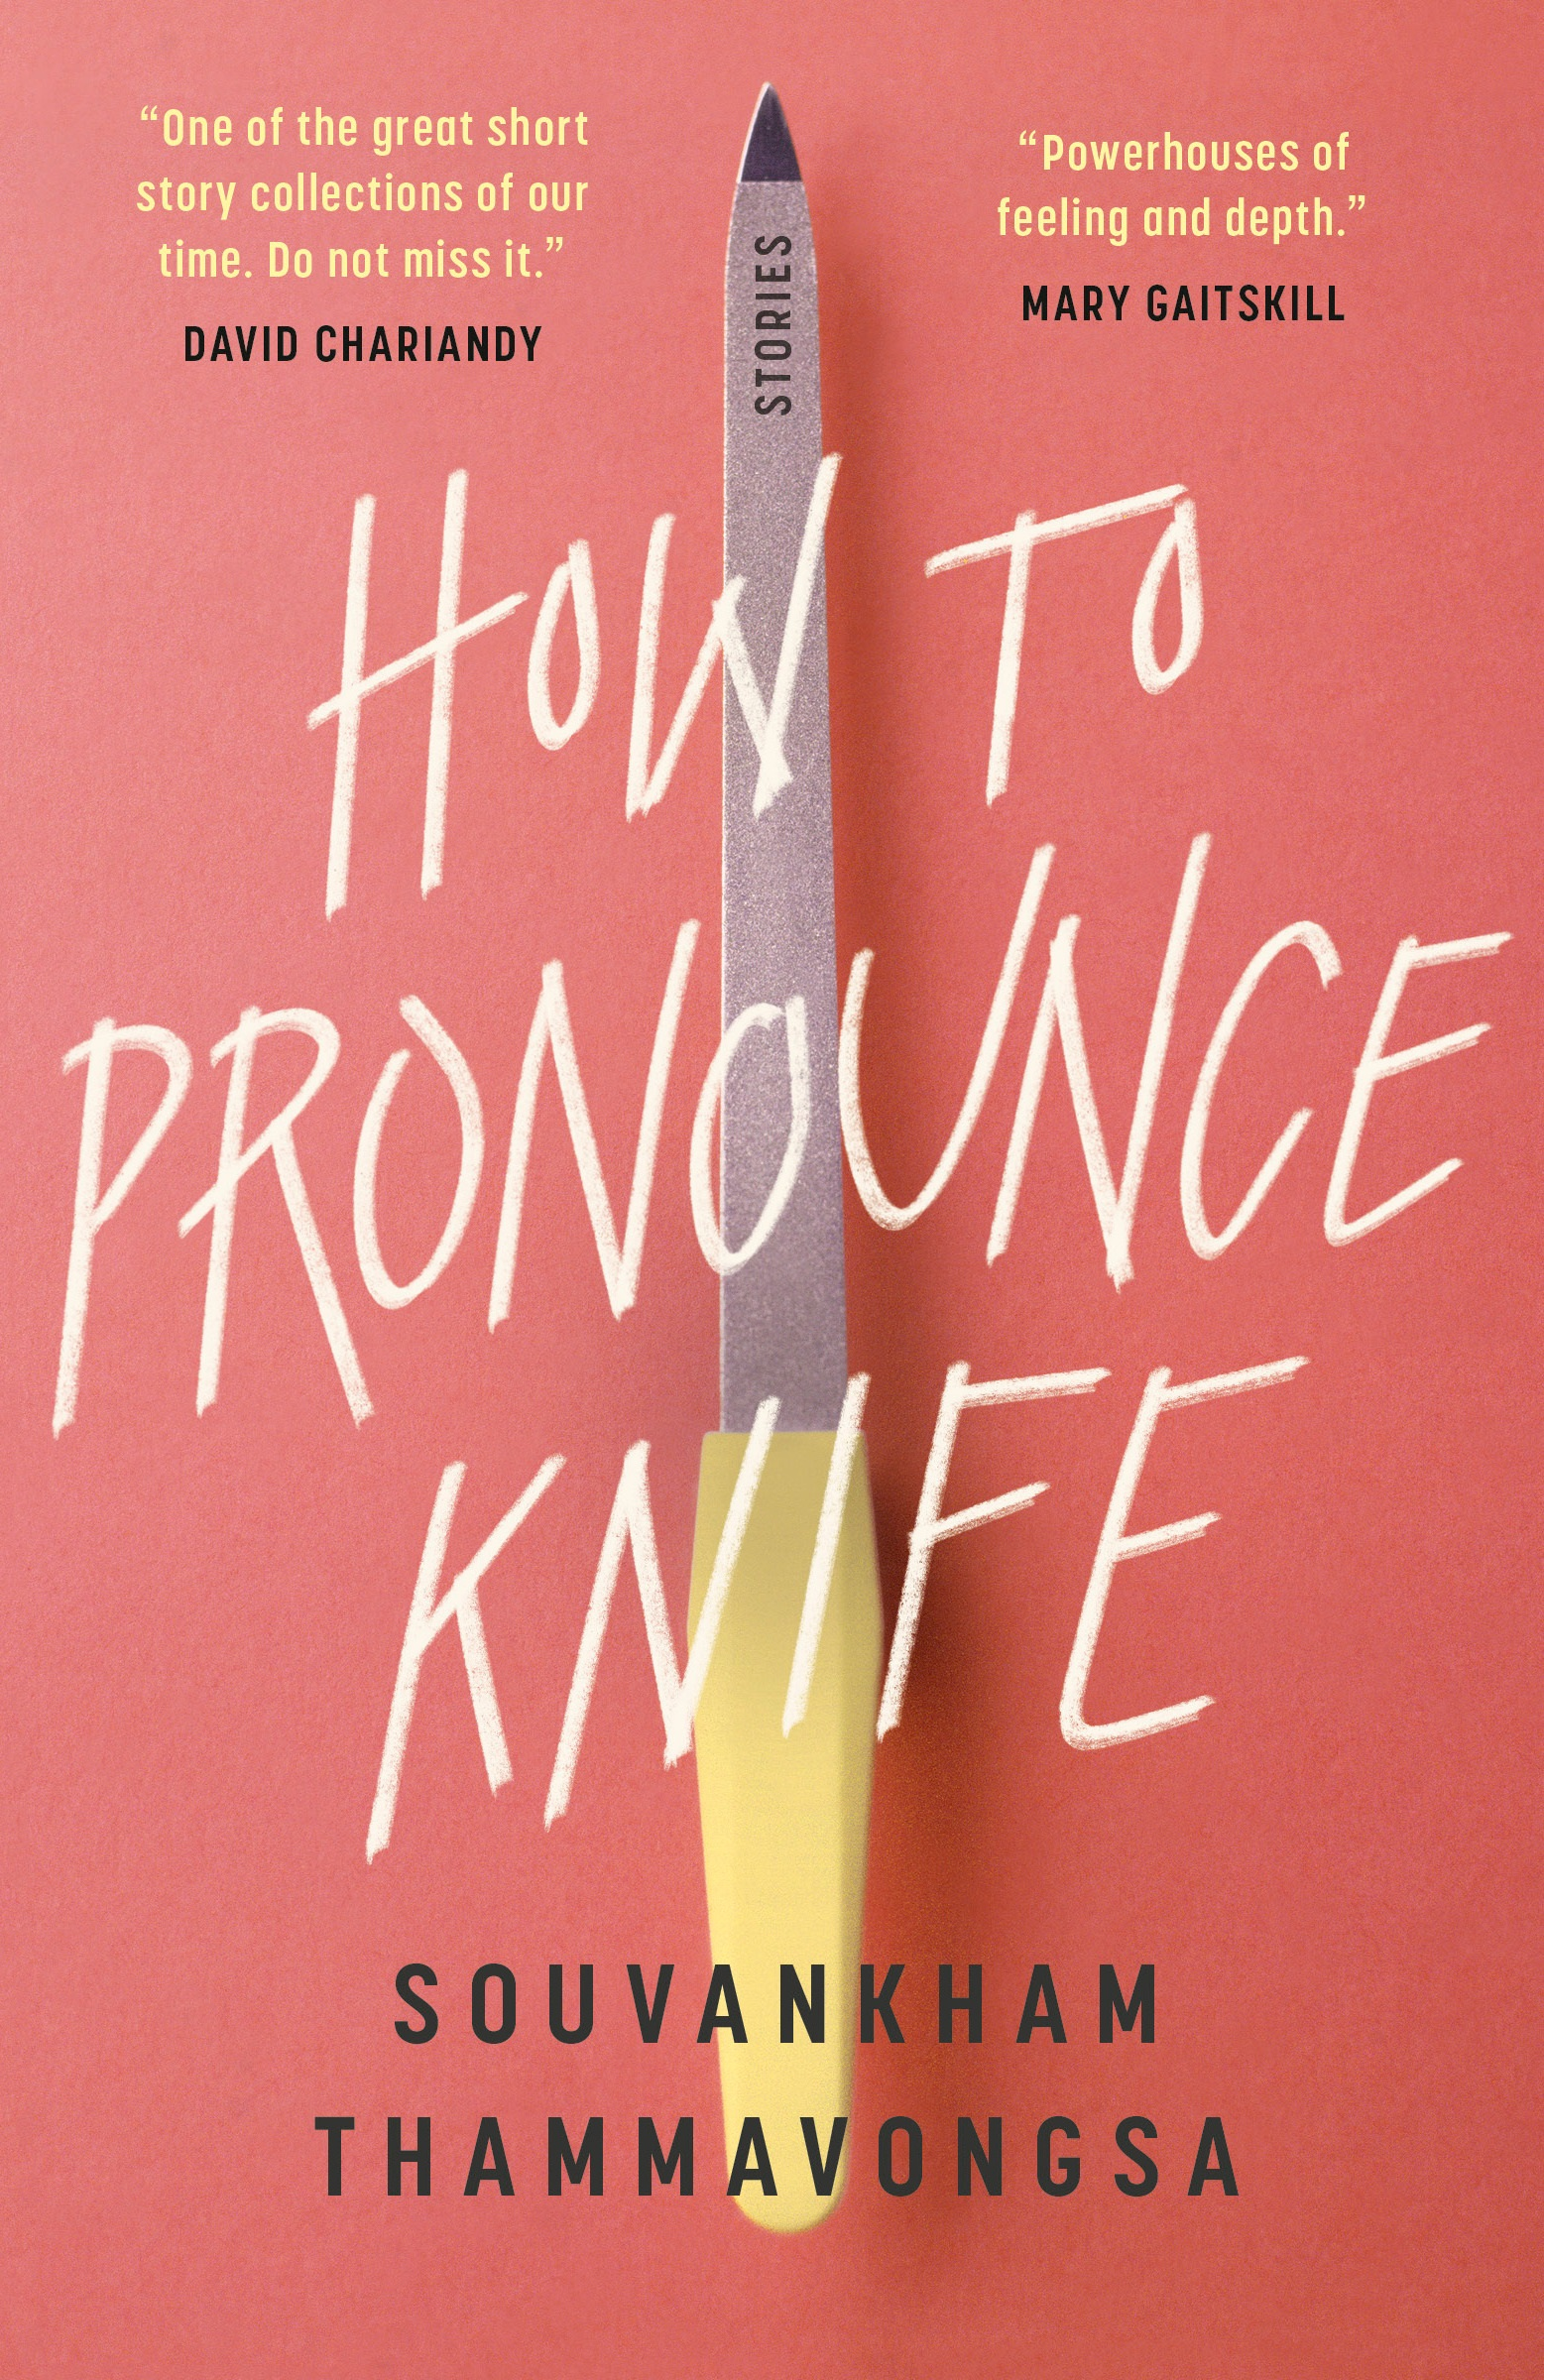 Thammavongsa Souvankham How to Pronounce Knife Book Jacket